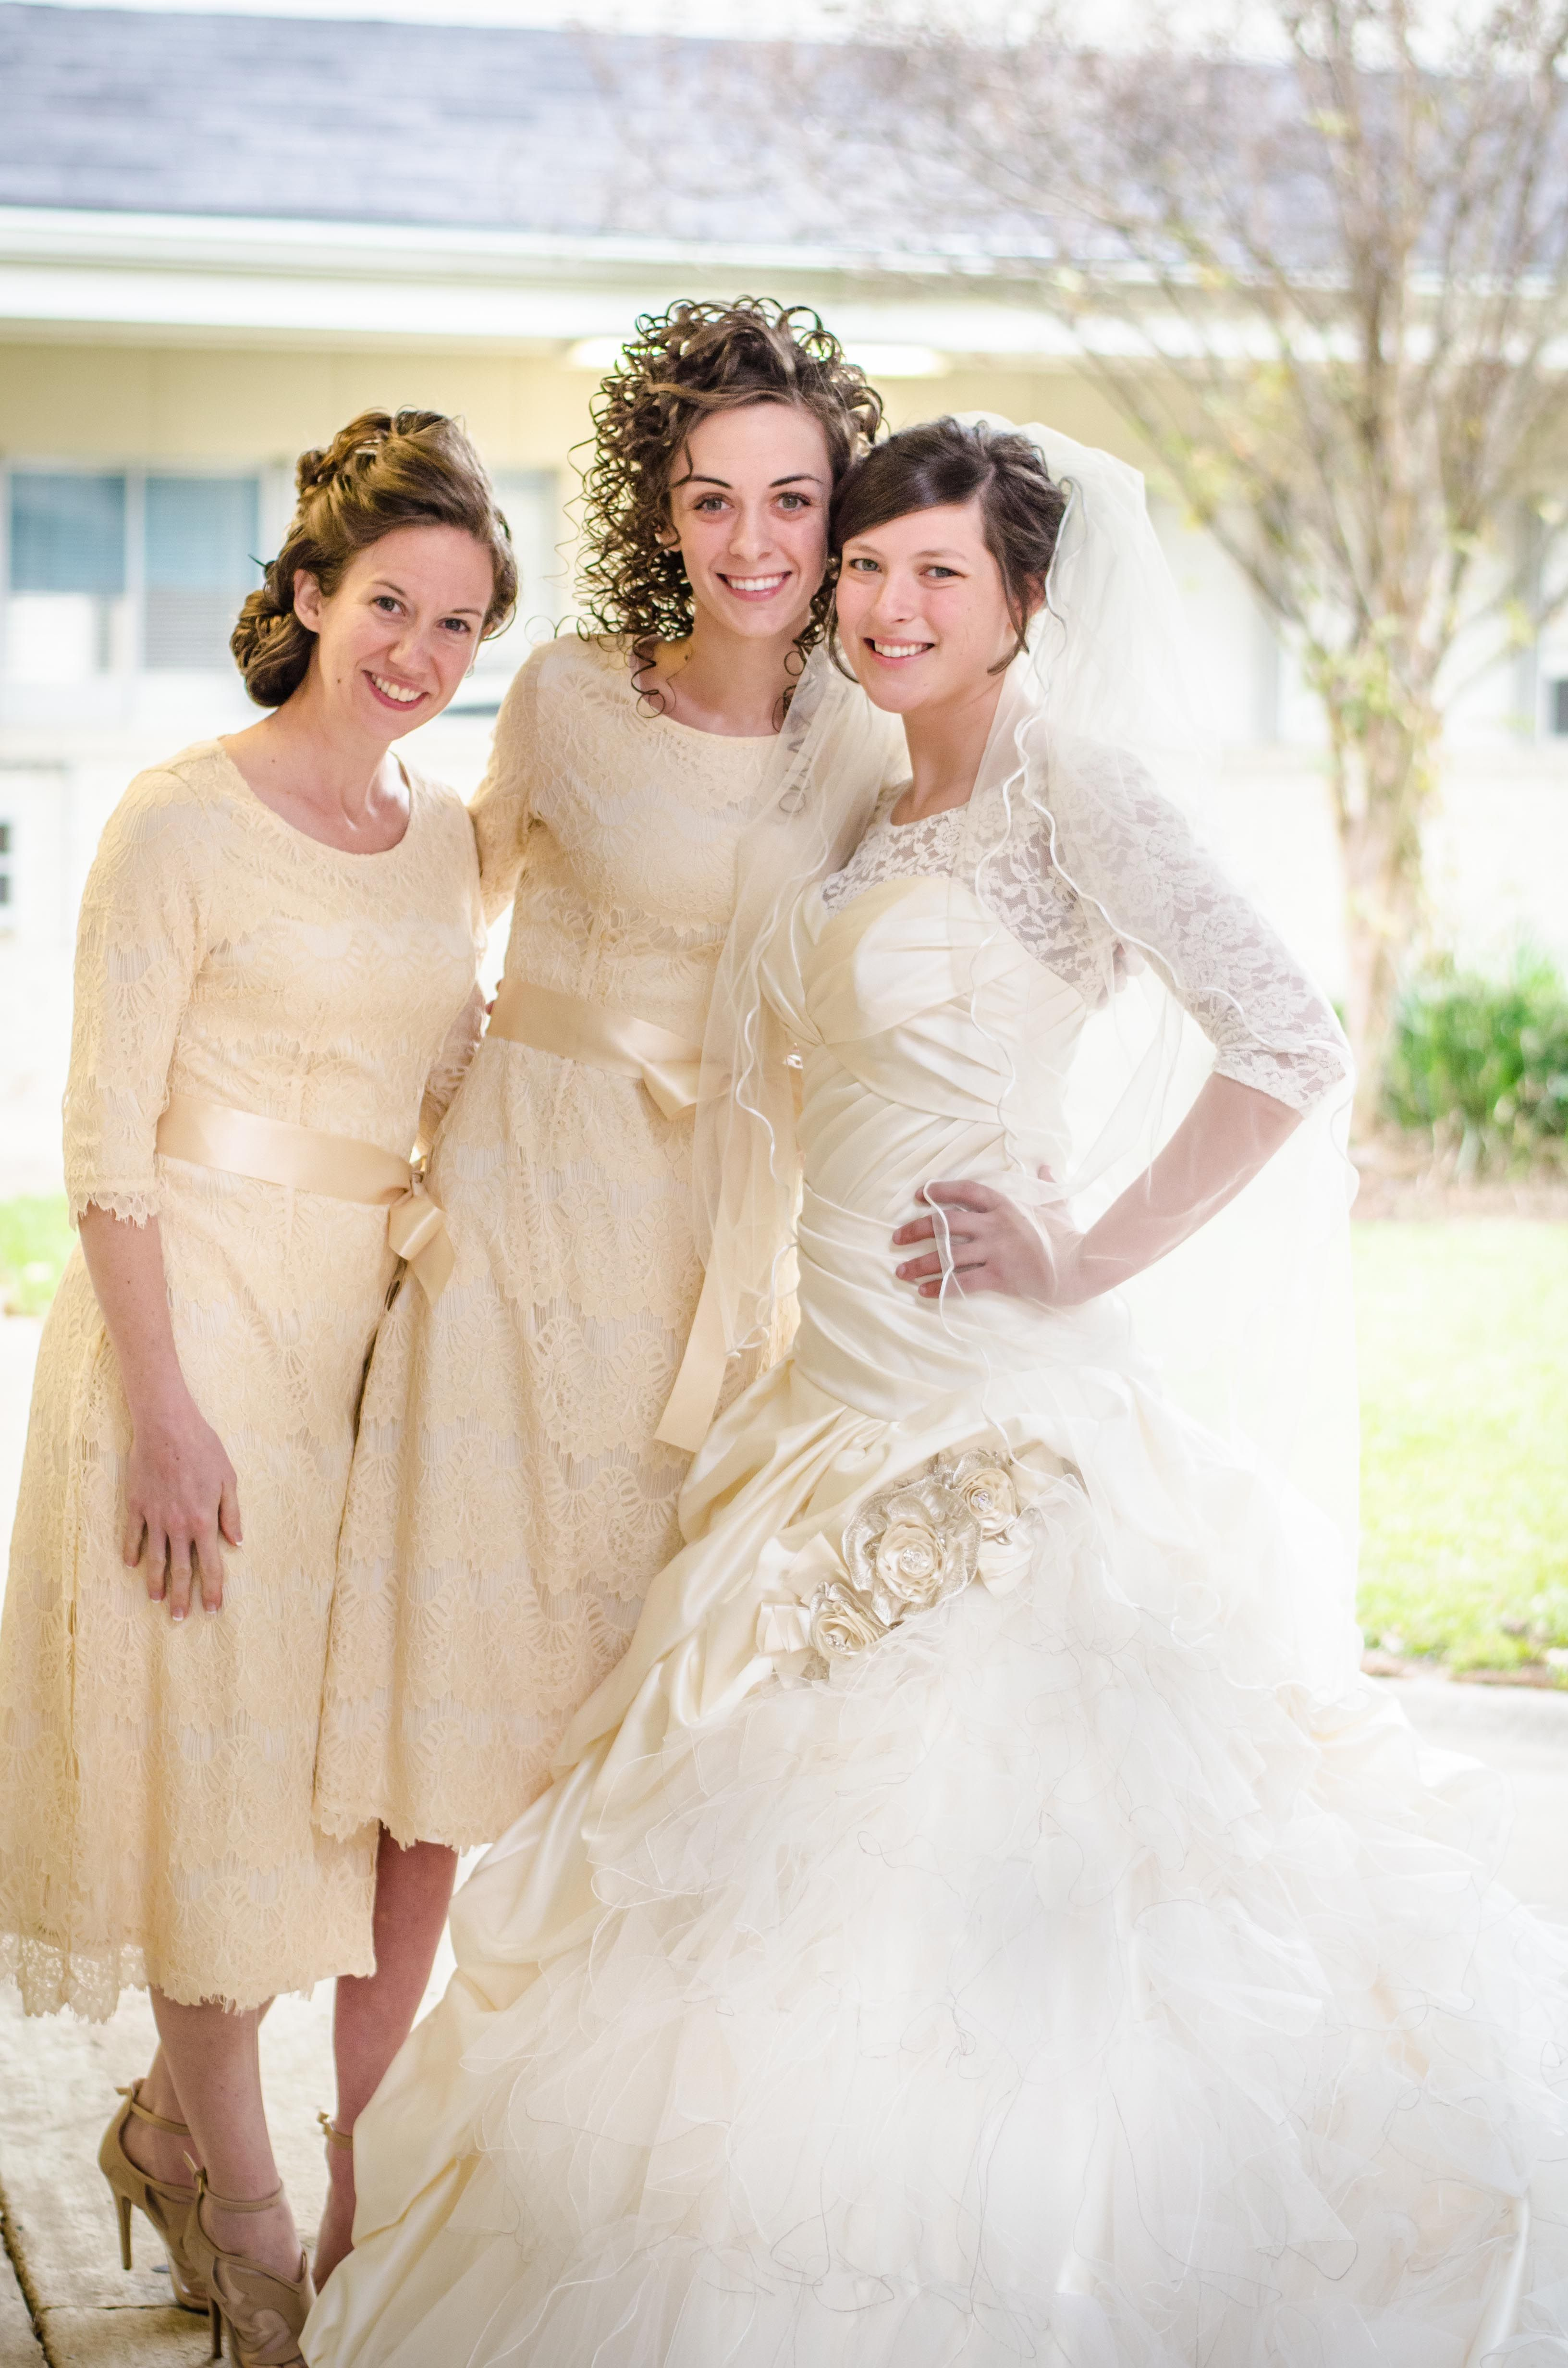 Stunning modest wedding party bridesmaid dresses all completely stunning modest wedding party bridesmaid dresses all completely modest daintyjewells daintyjewells ombrellifo Gallery